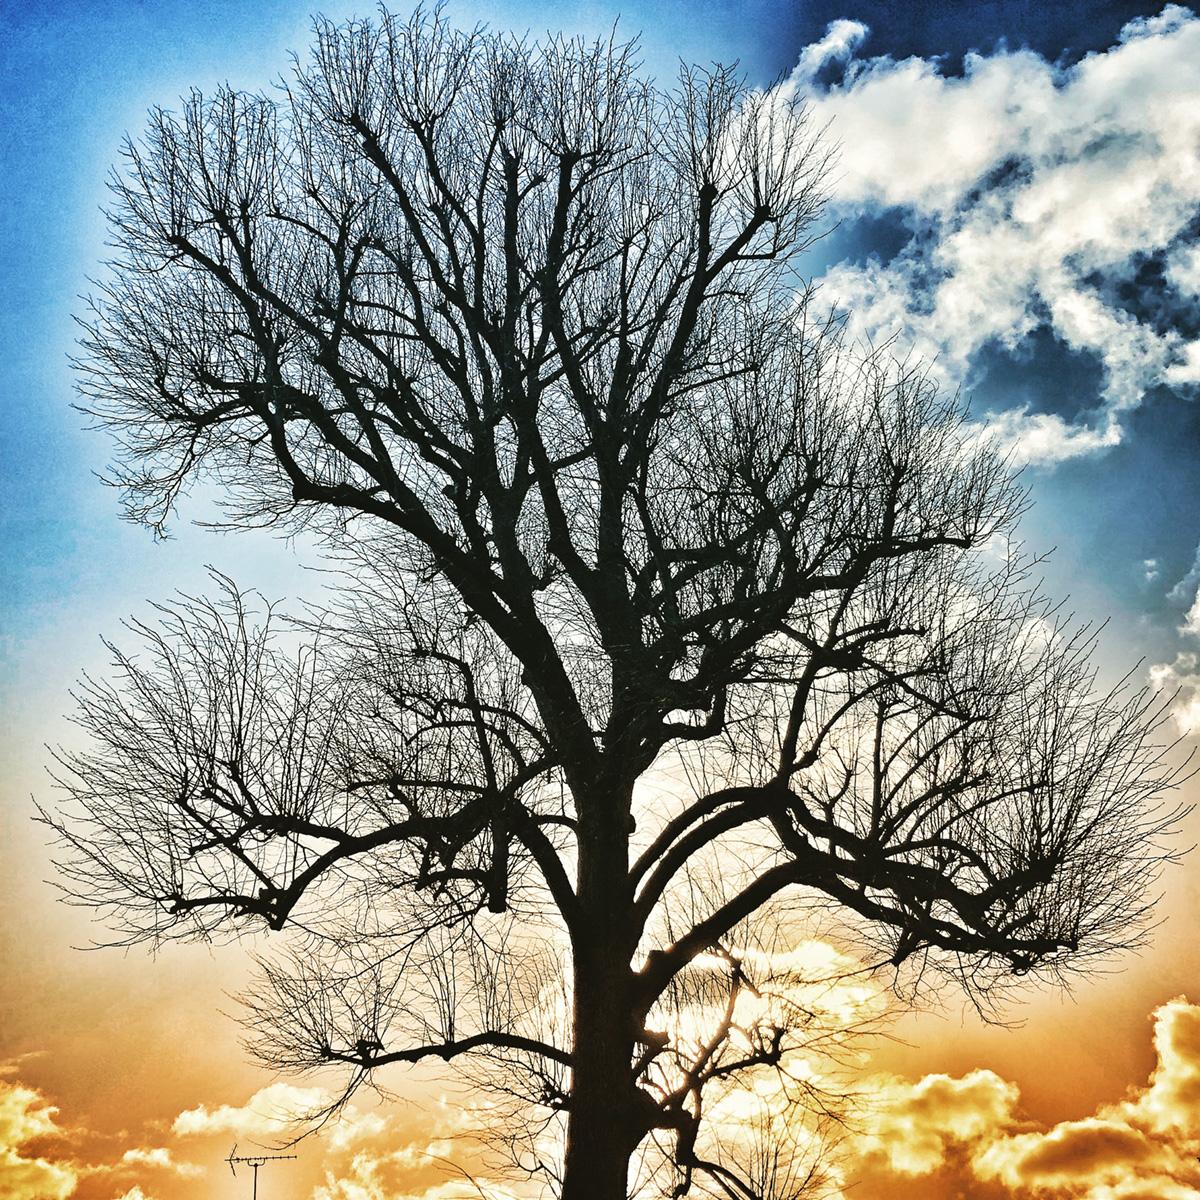 Bare Tree in Golden Sky